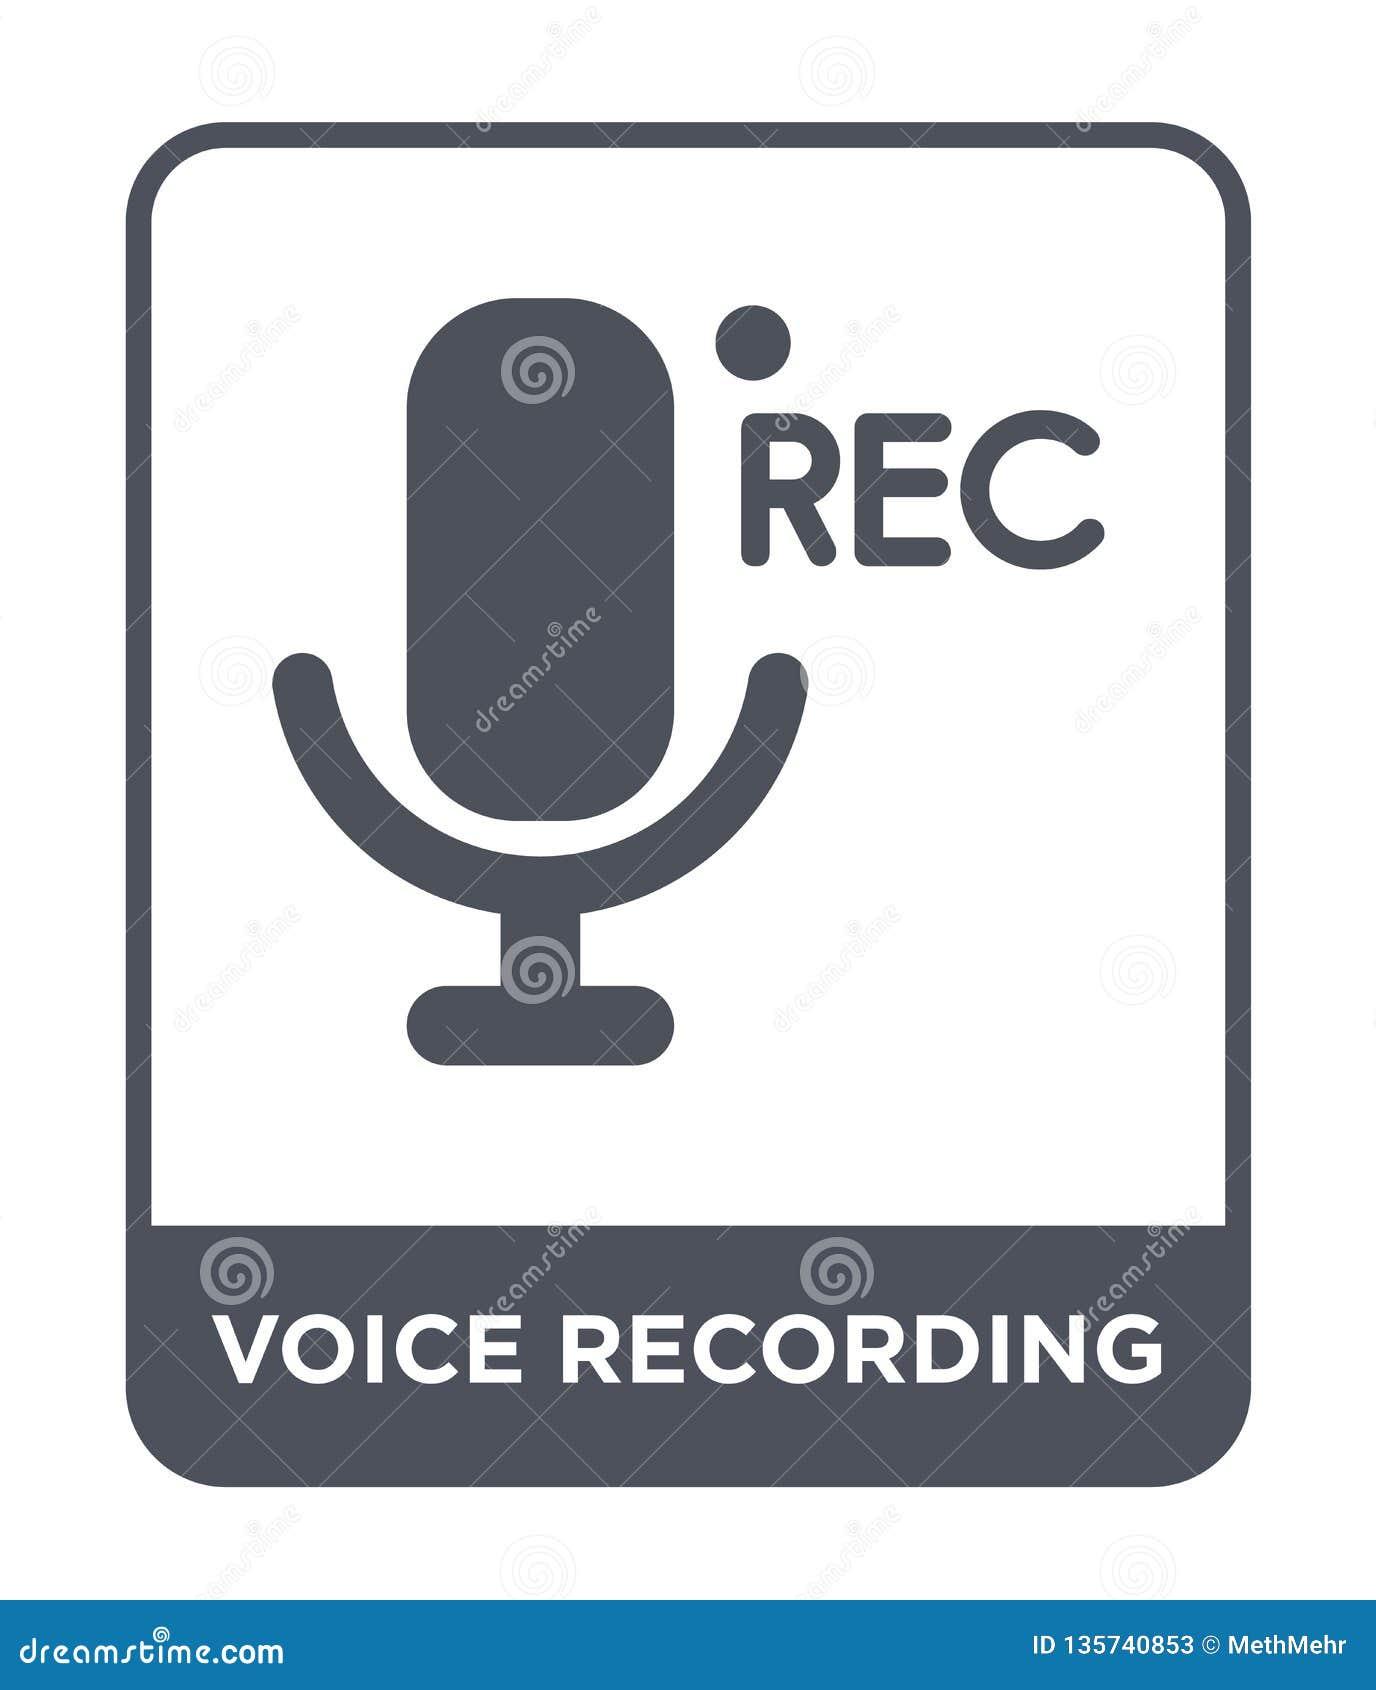 voice recording icon in trendy design style. voice recording icon isolated on white background. voice recording vector icon simple